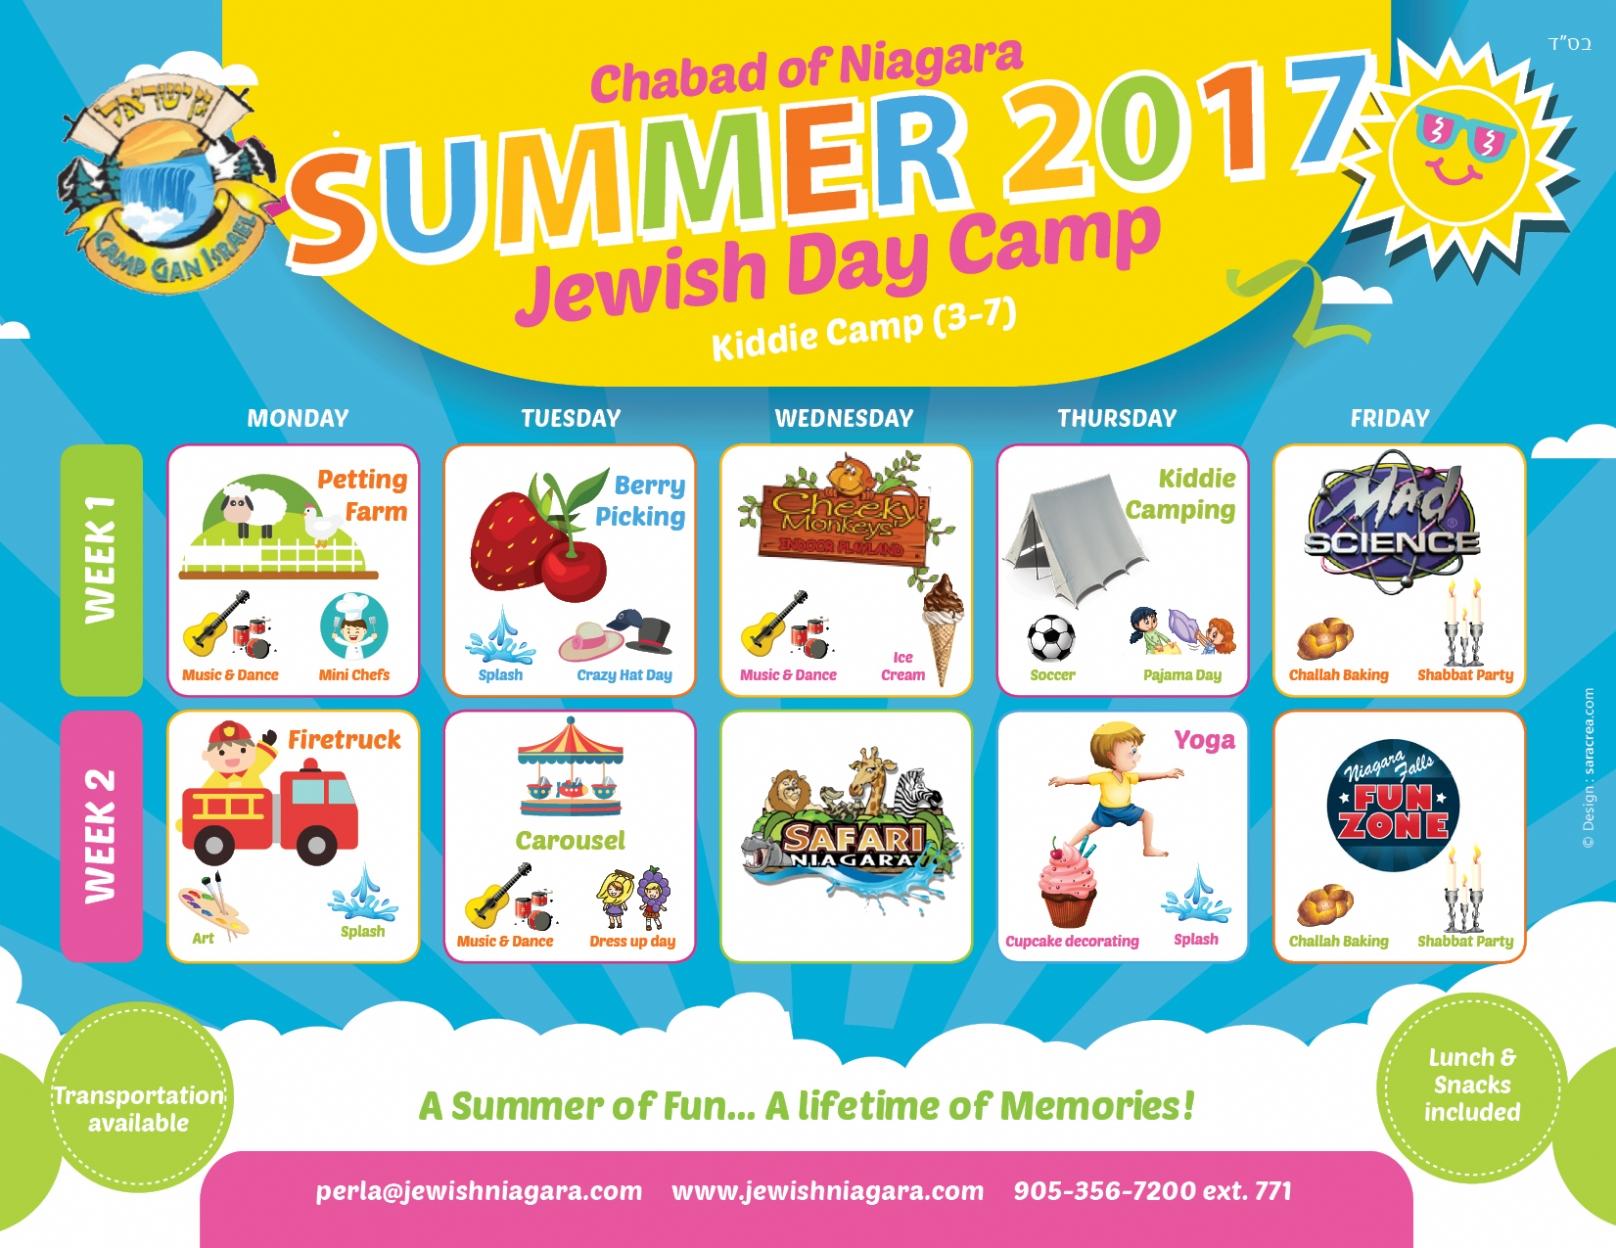 03-daycamp-program-kiddie.jpg